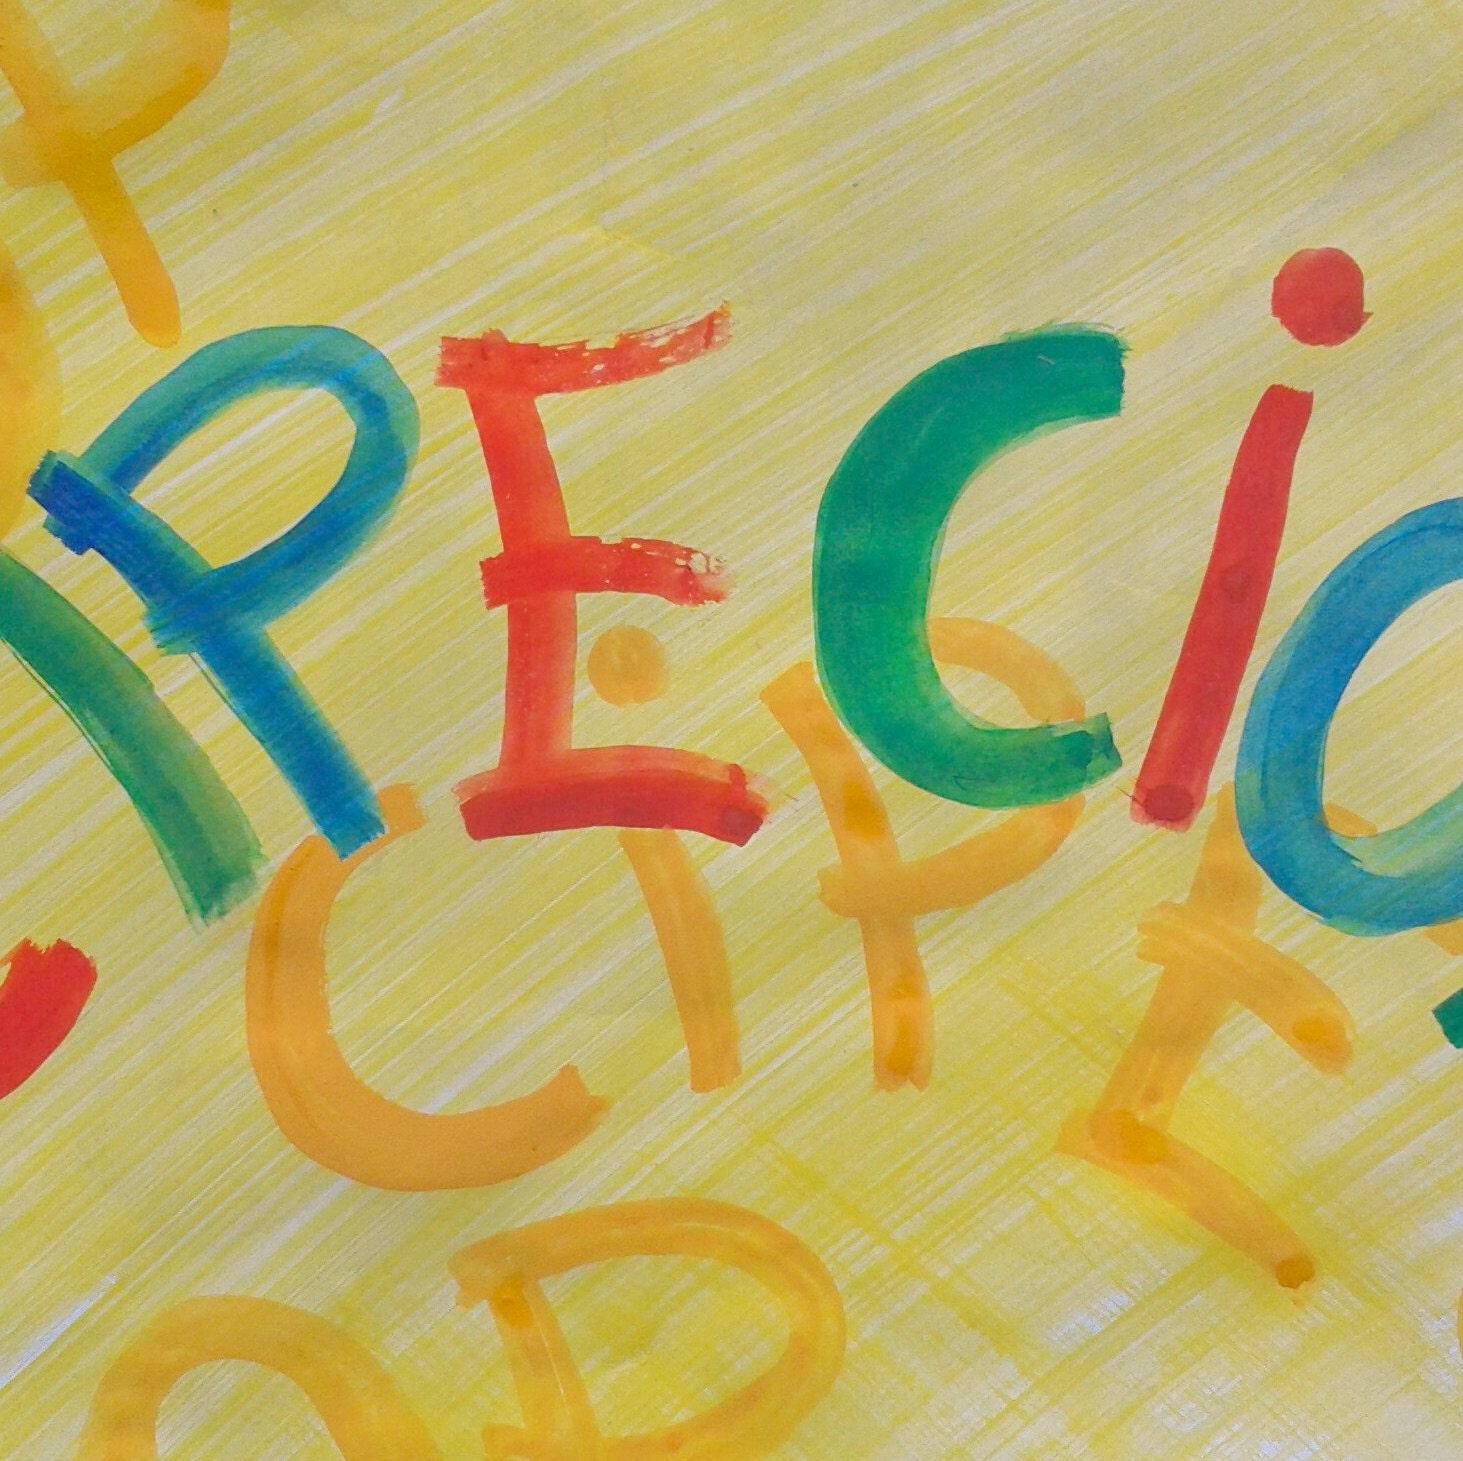 Dipinti e pannelli handmade per la tua casa di paintingsbycipeciop